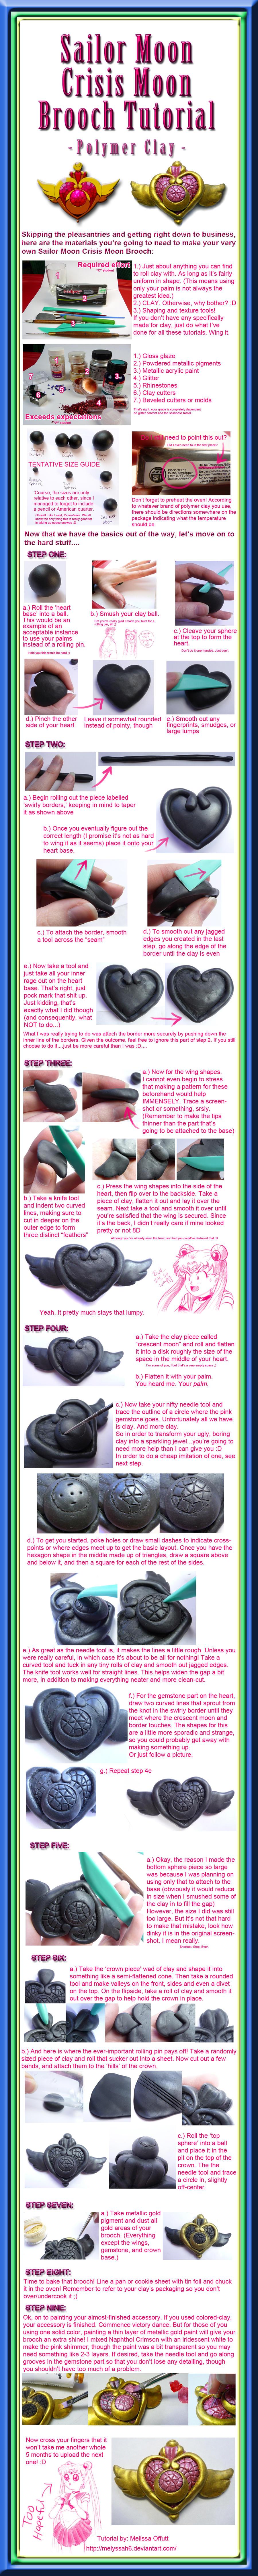 Sailor Moon Crisis Moon Brooch Tutorial by Melyssah6